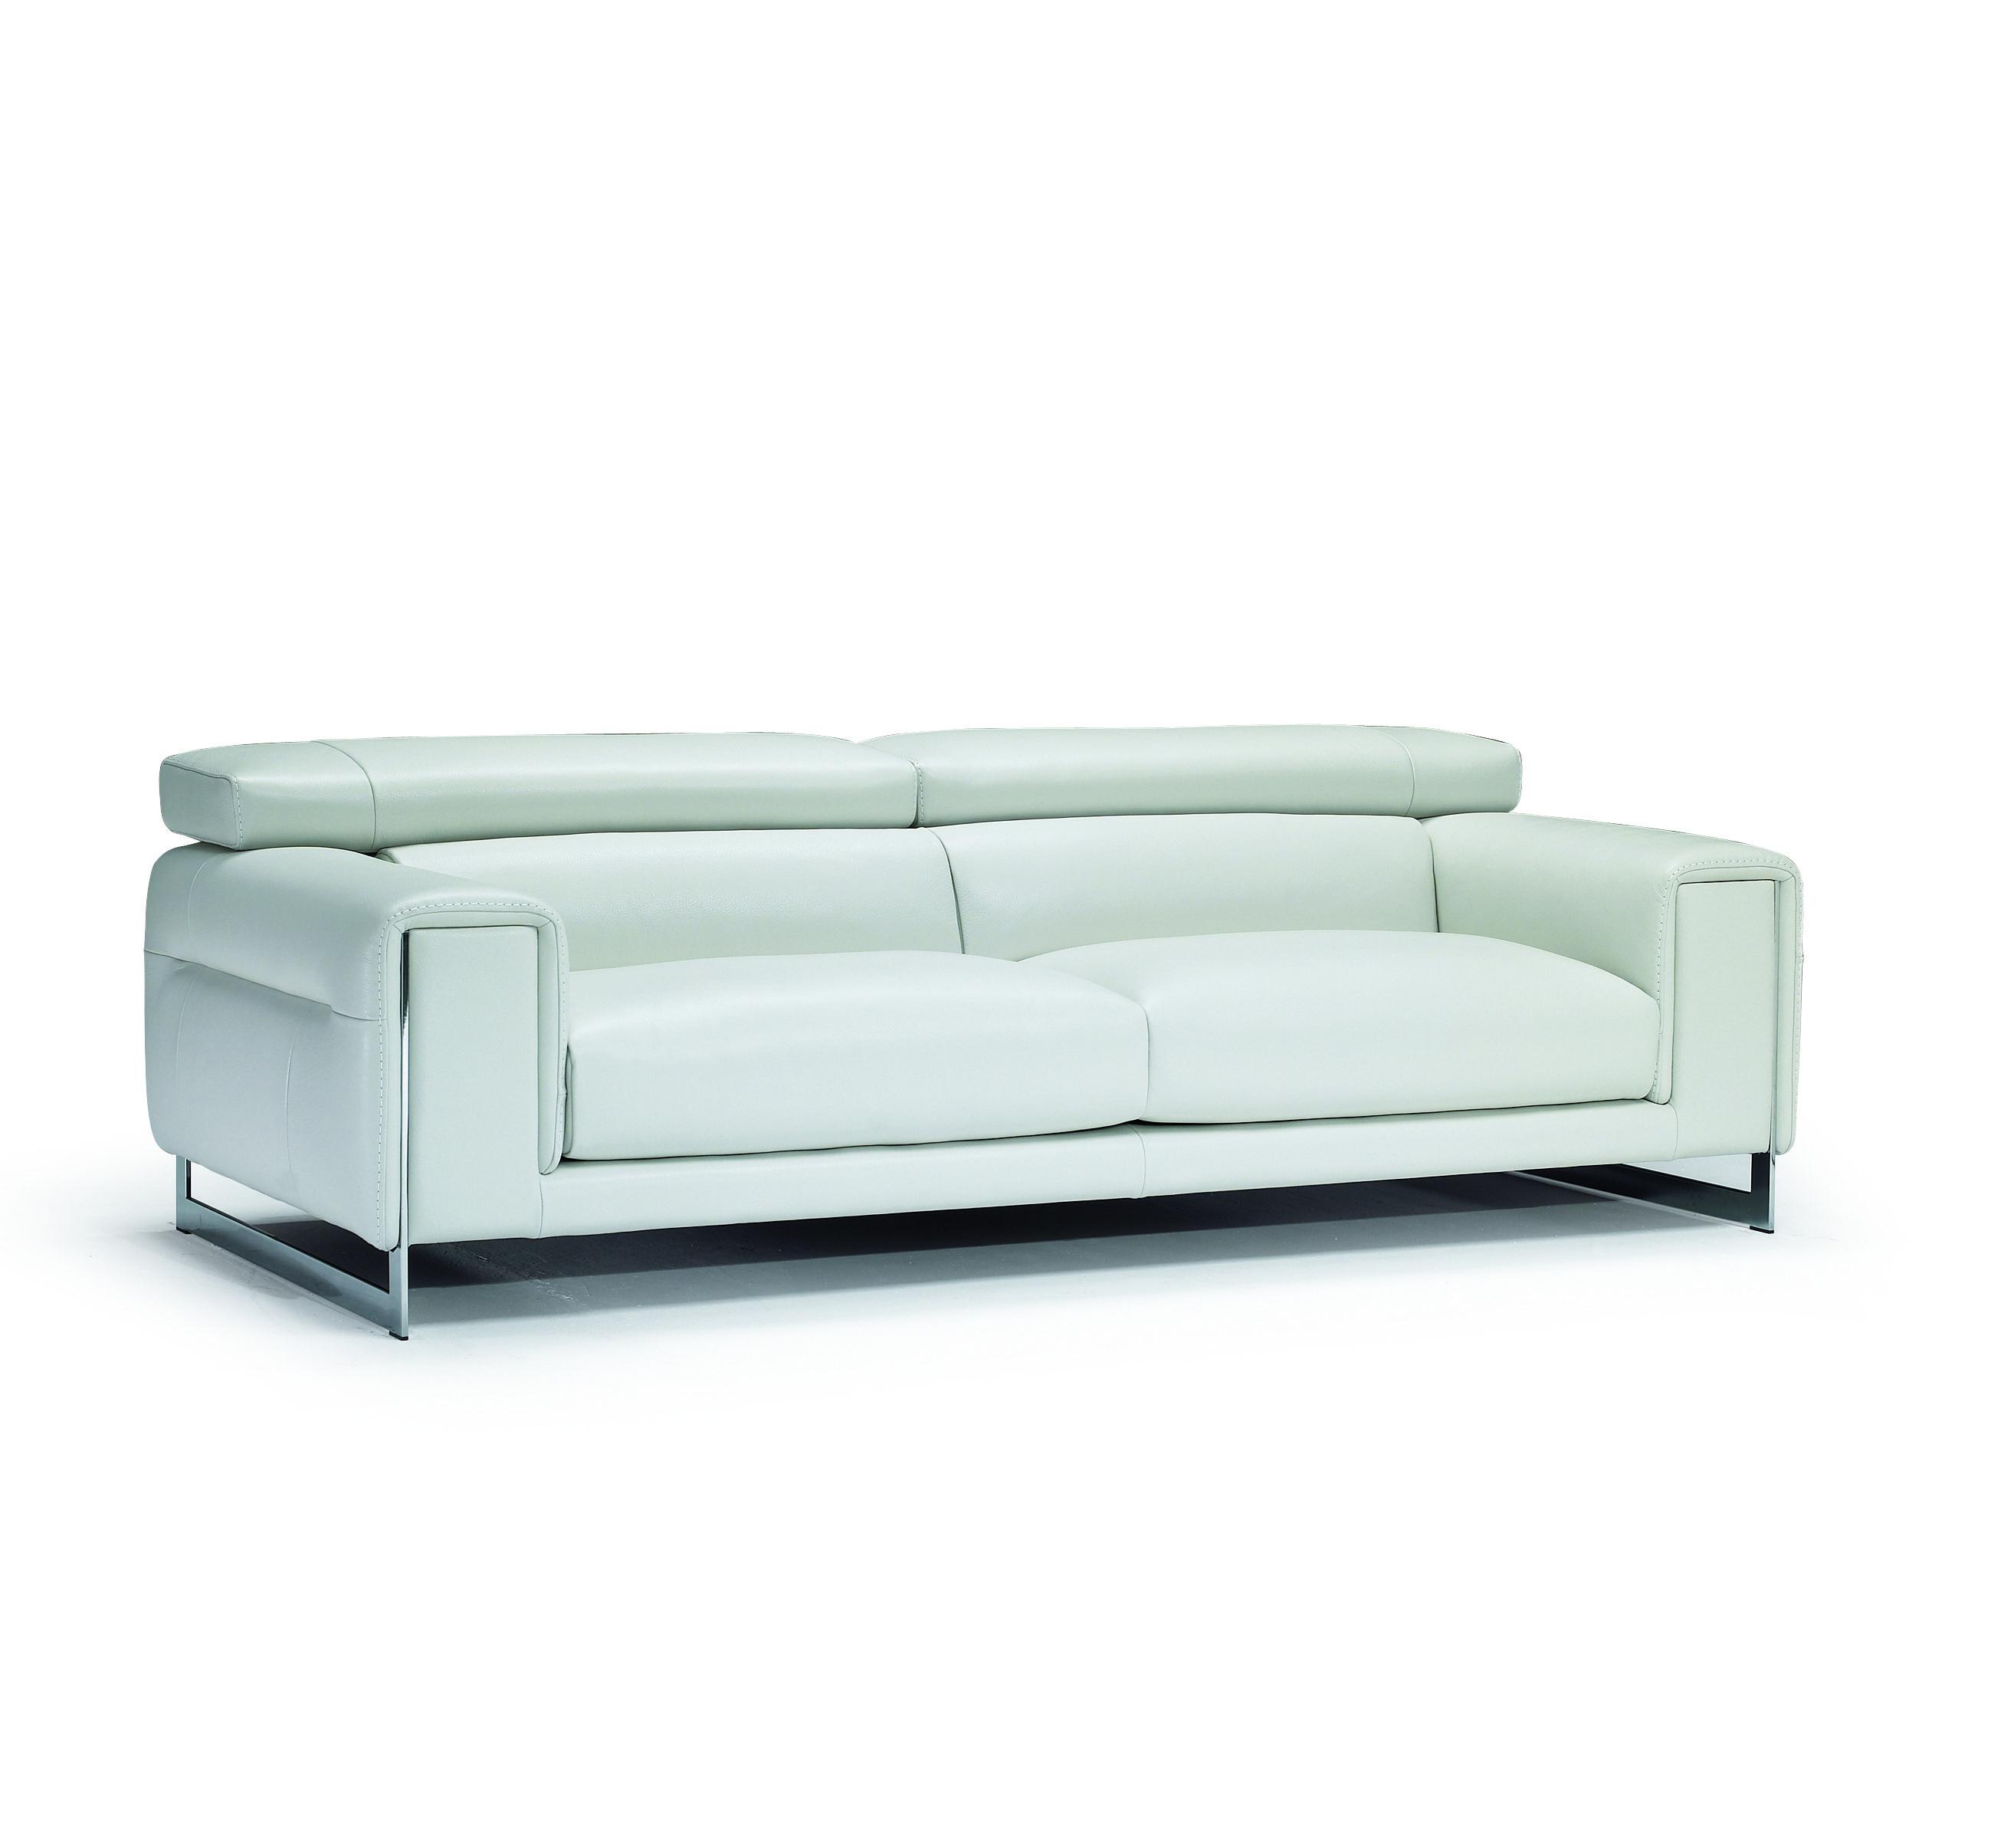 Etoile Sofa By Natuzzi Italia Natuzzi Italia